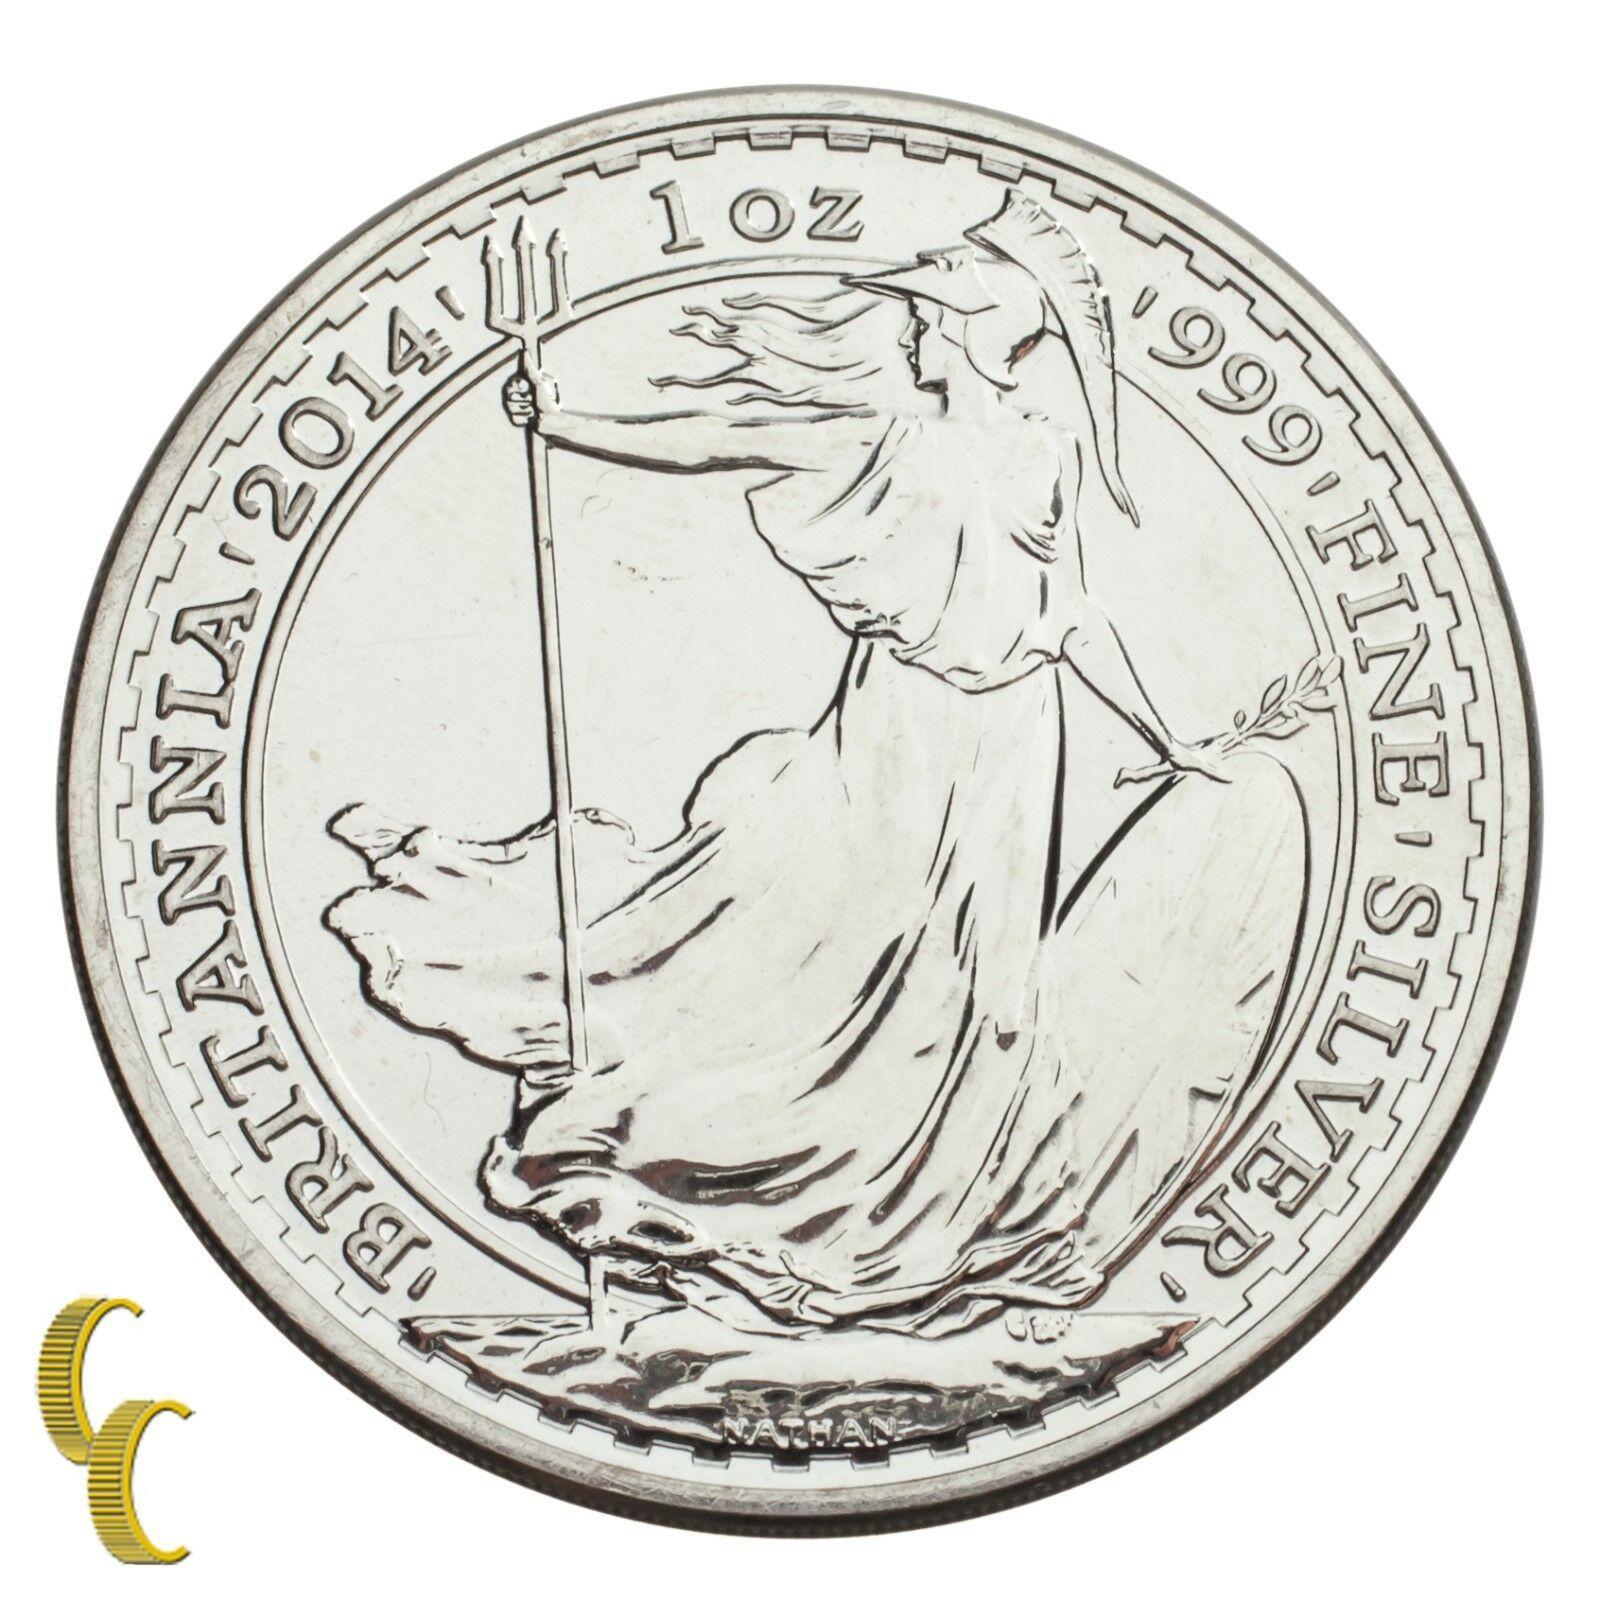 2014 Gran Bretagna Britannia Argento 2 Pound 1 Oncia (Bu ) Brillante UNC